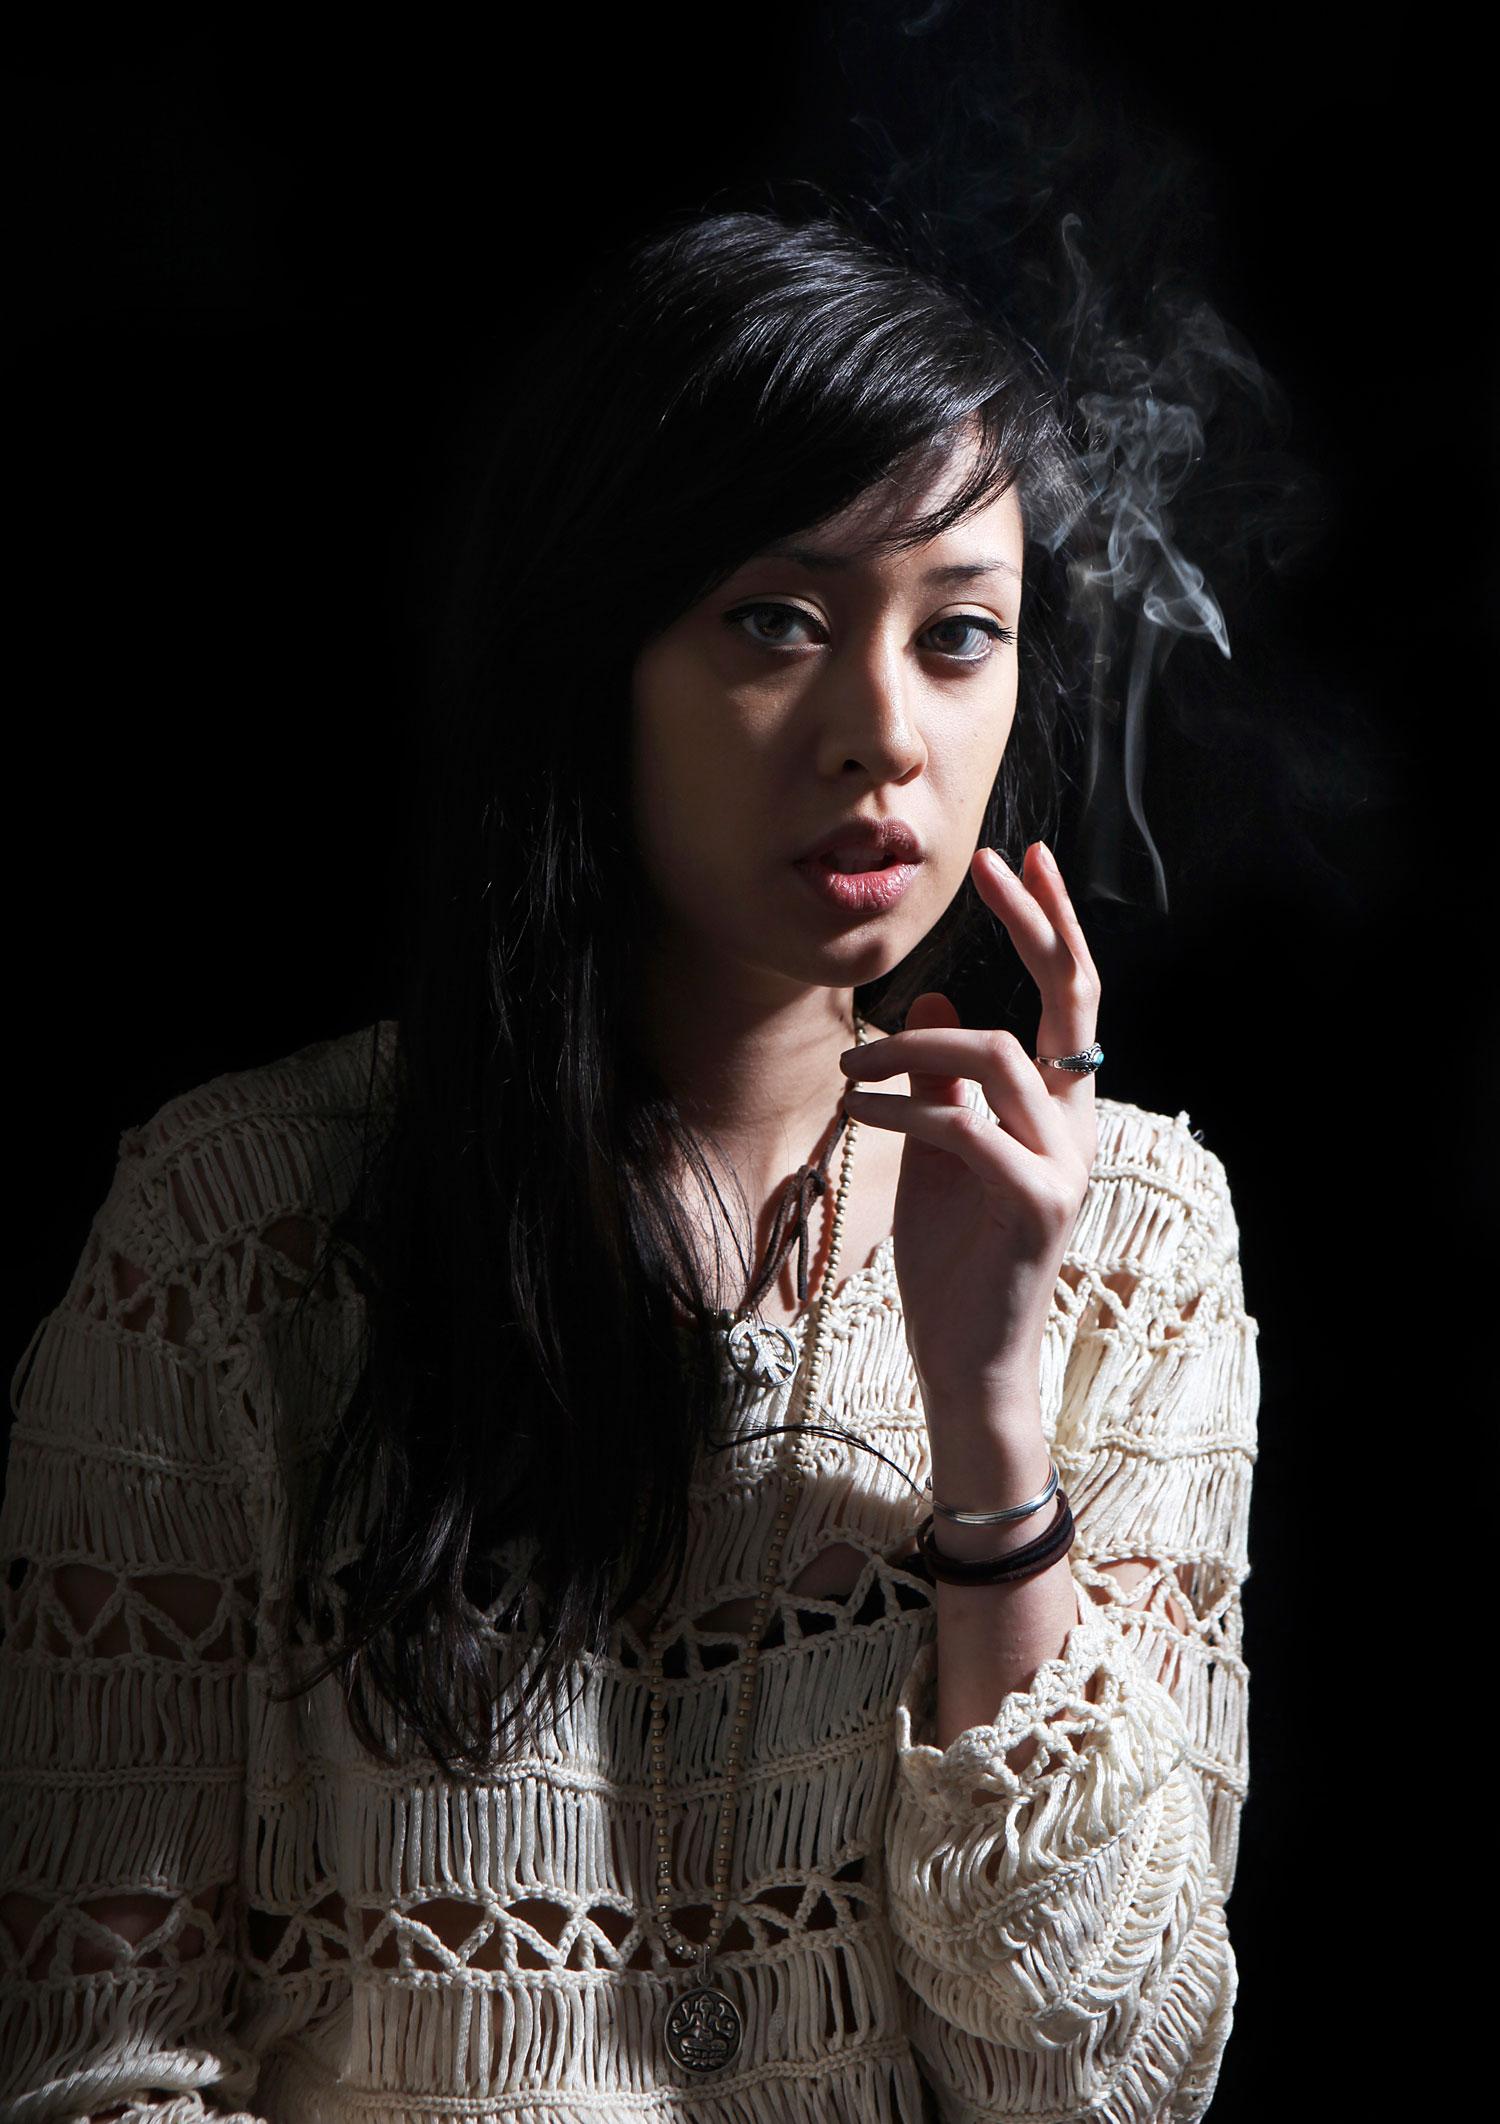 amanda-no-cigarette.jpg